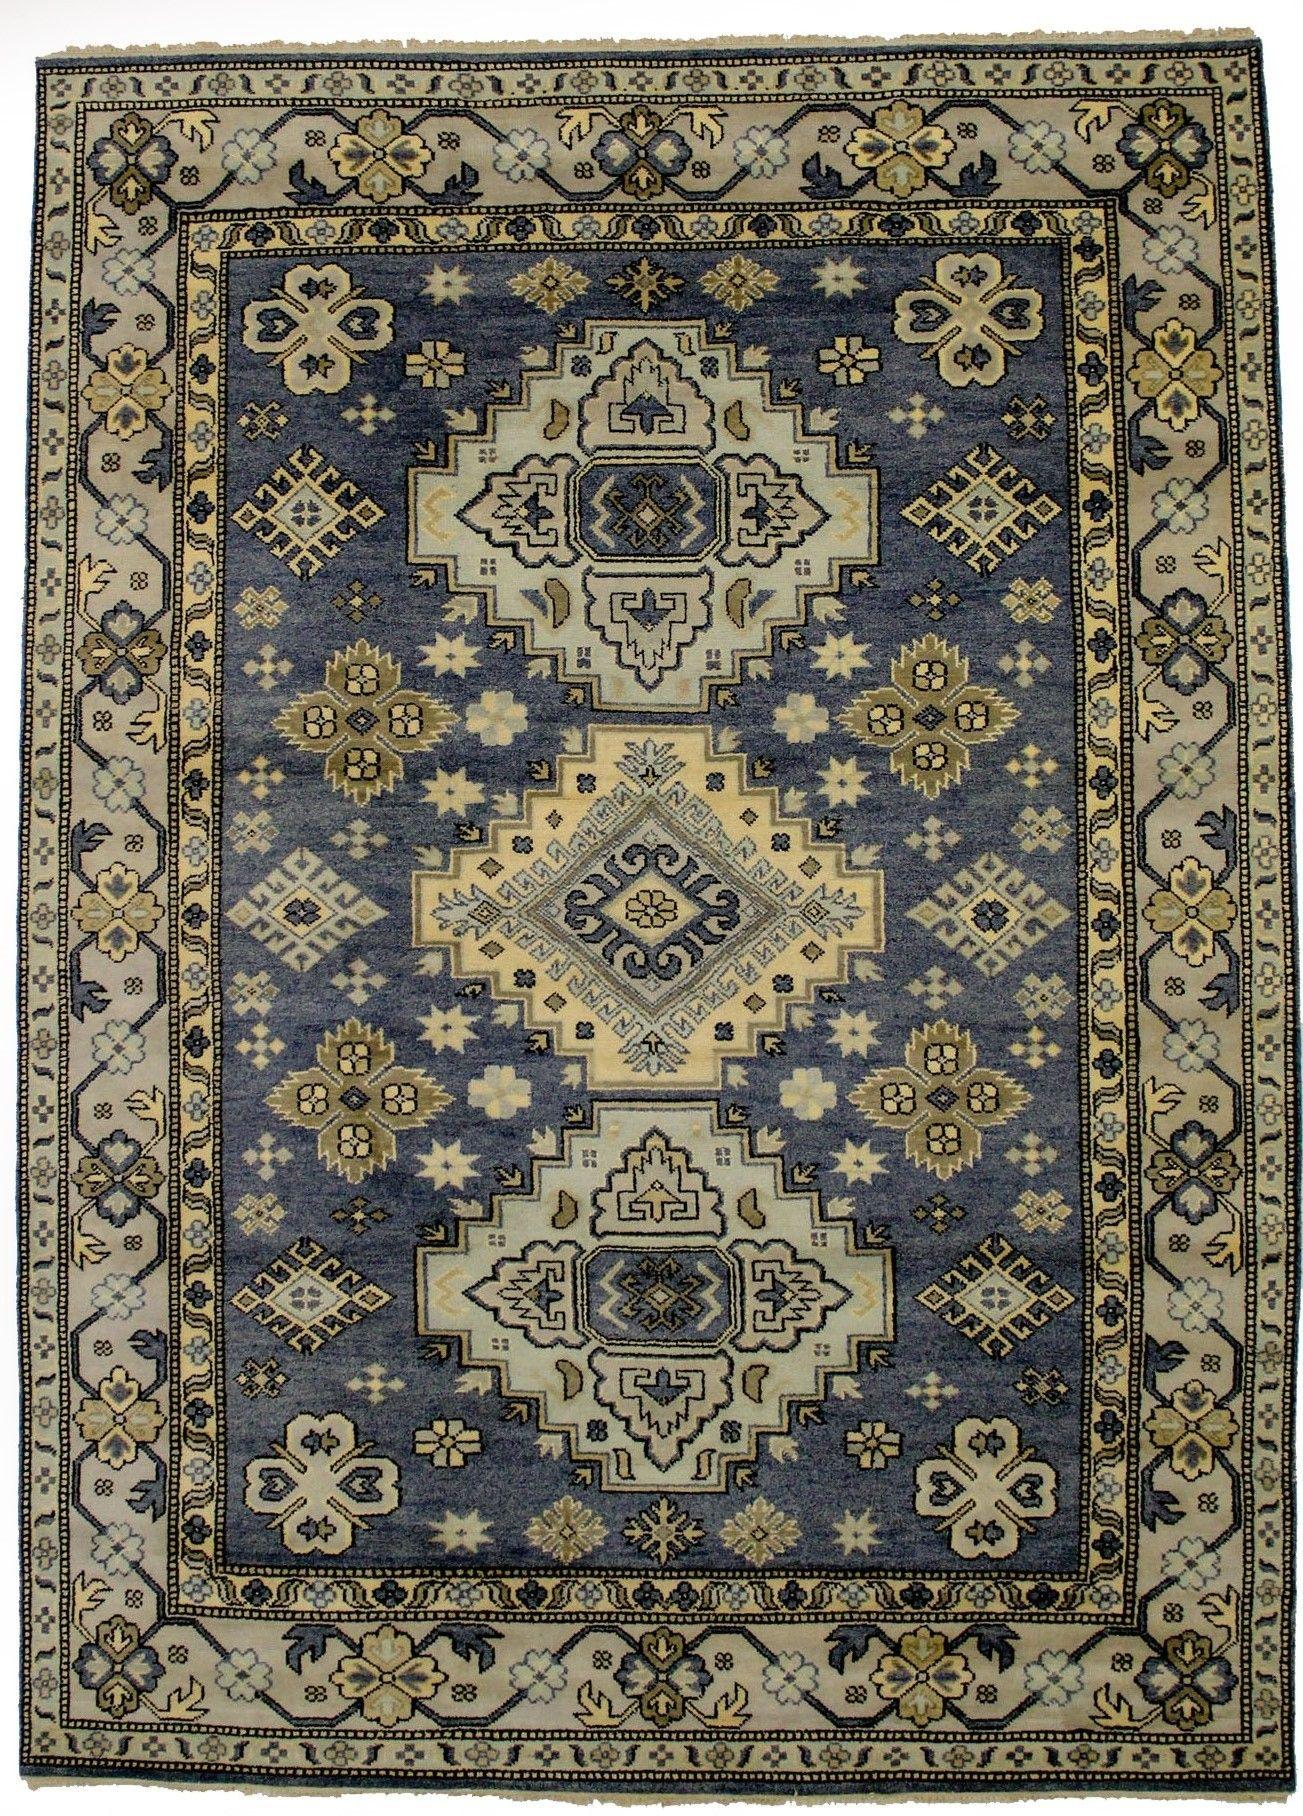 Antique Persian Rugs Dazzling Handmade Vintage Style Kazak